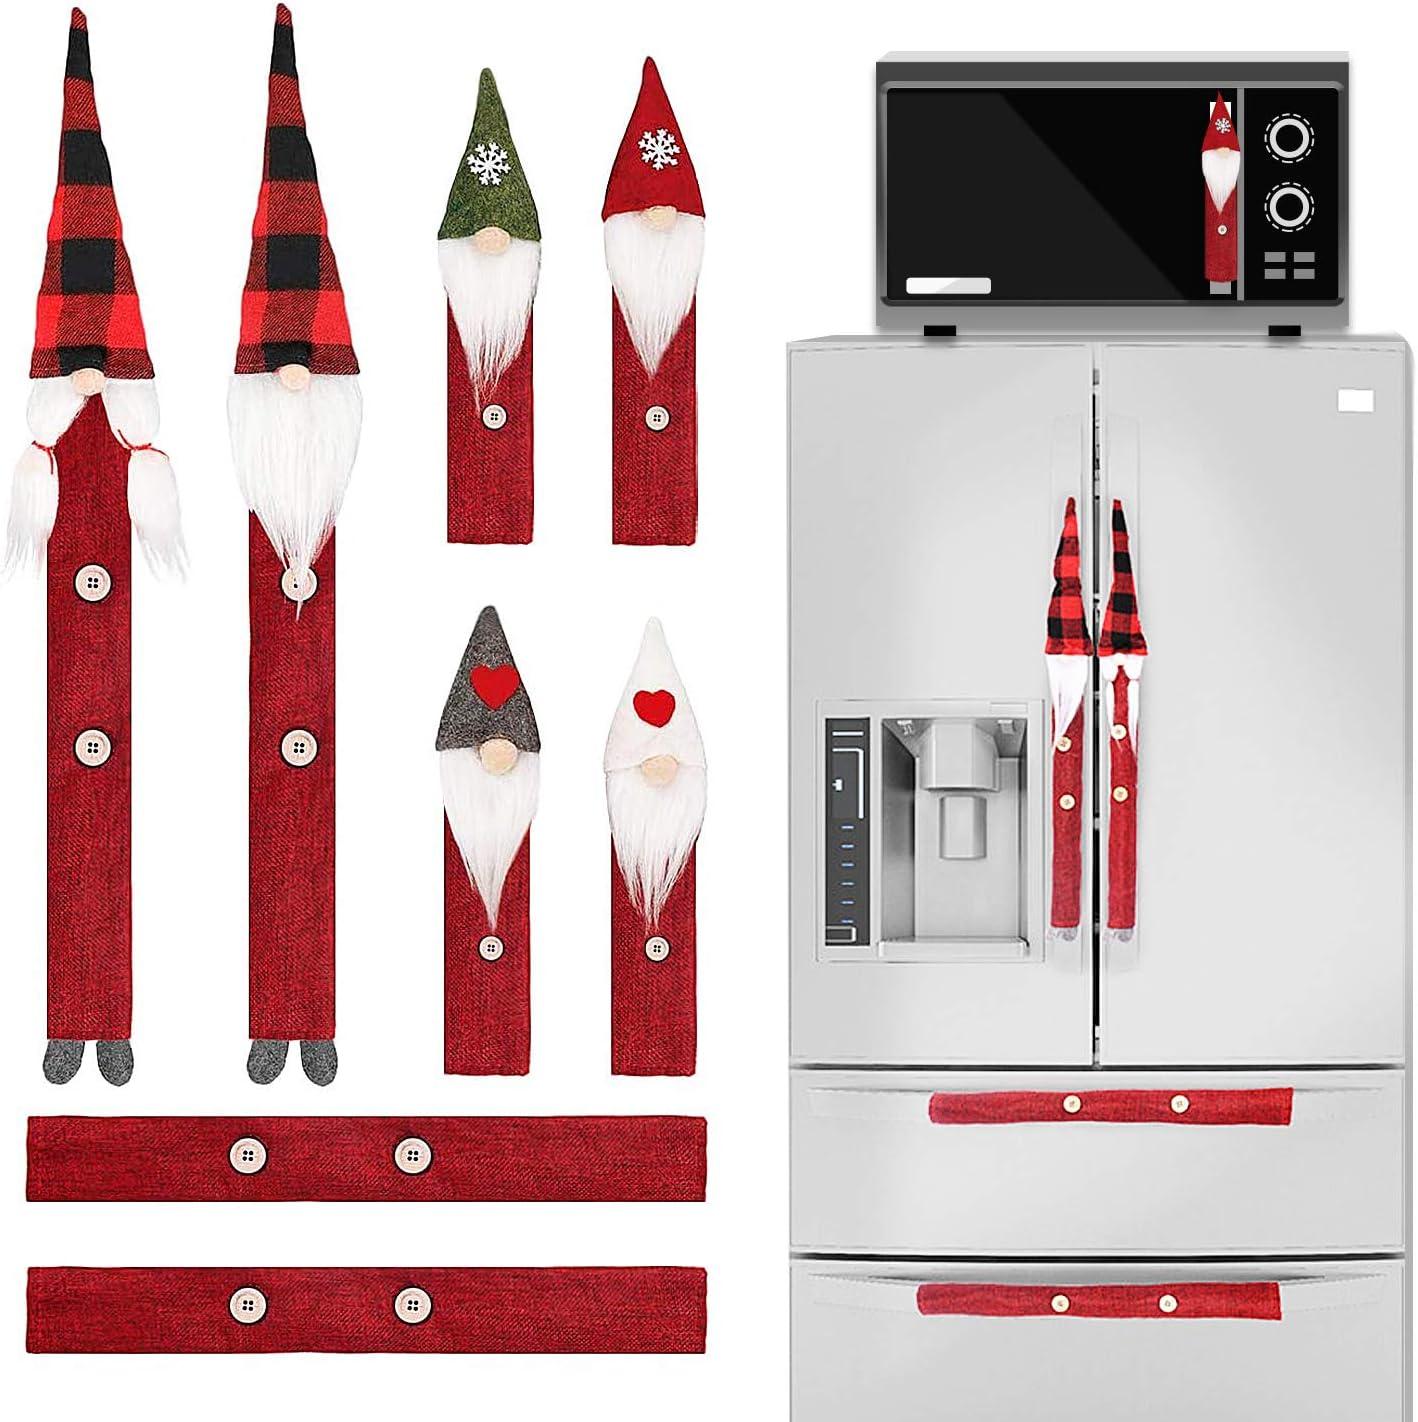 Sirozi 8 Pieces Christmas Refrigerator Handle Covers Set, Xmas S